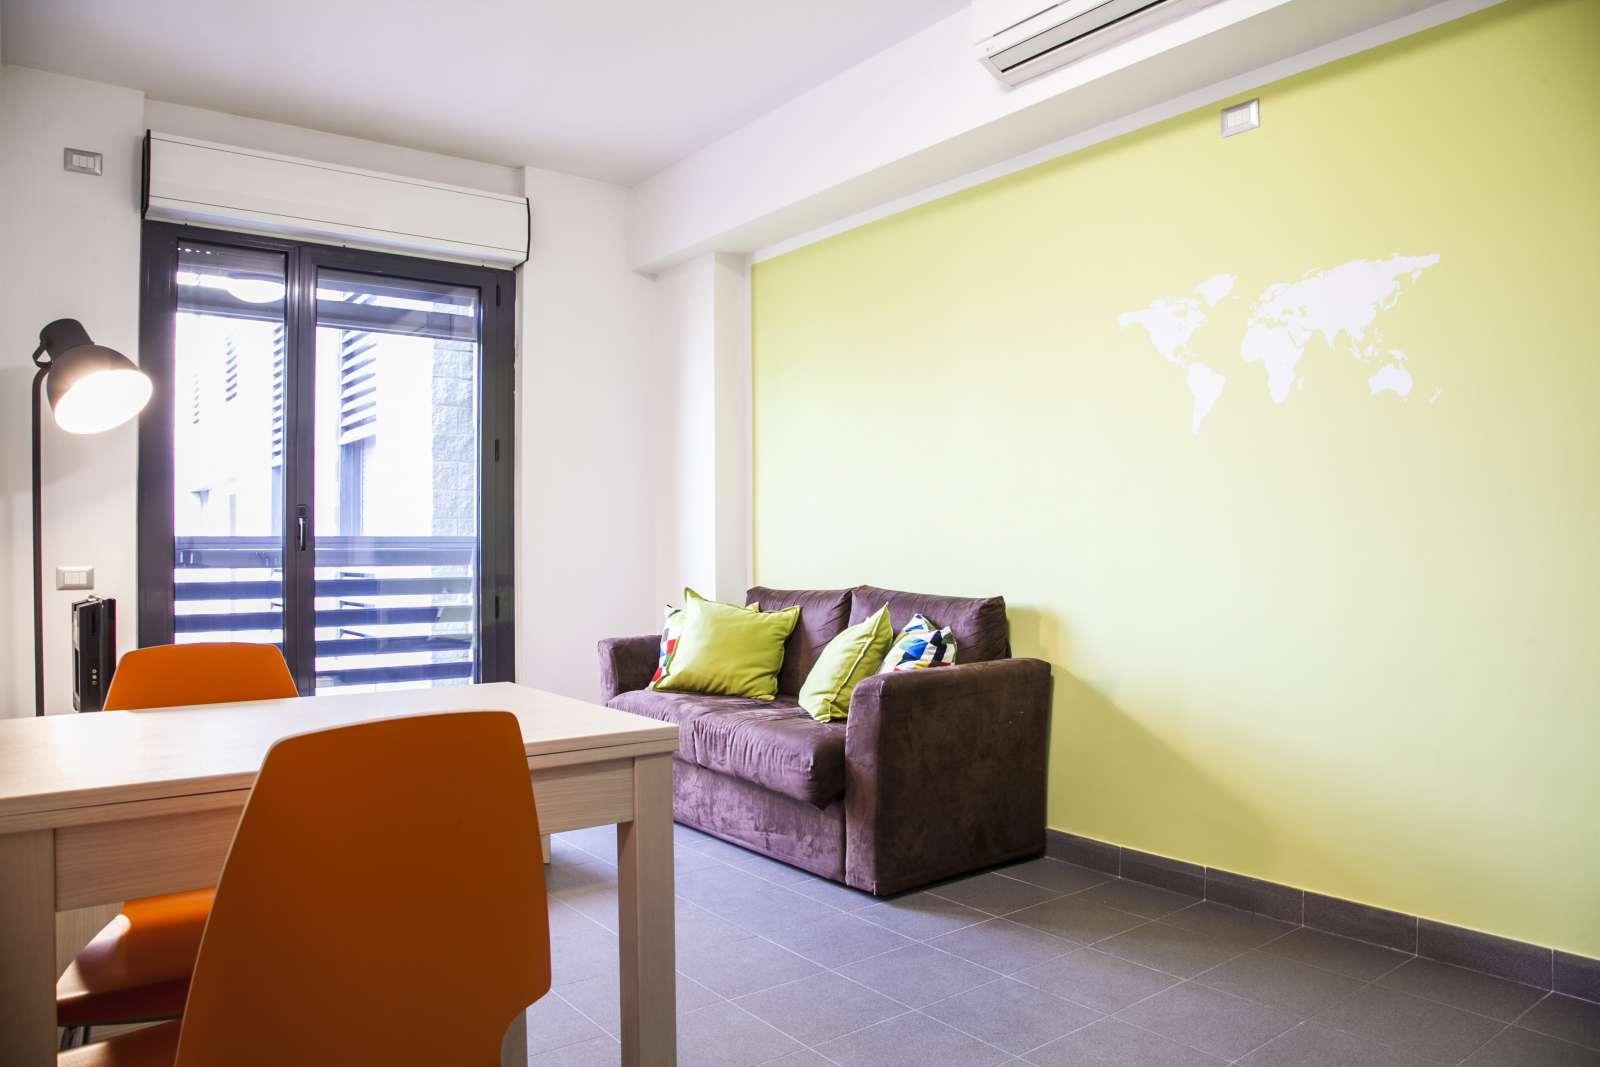 Ample 1 Bedroom Apartment For Rent In Tor Vergata Rome Ref 144423 Spotahome